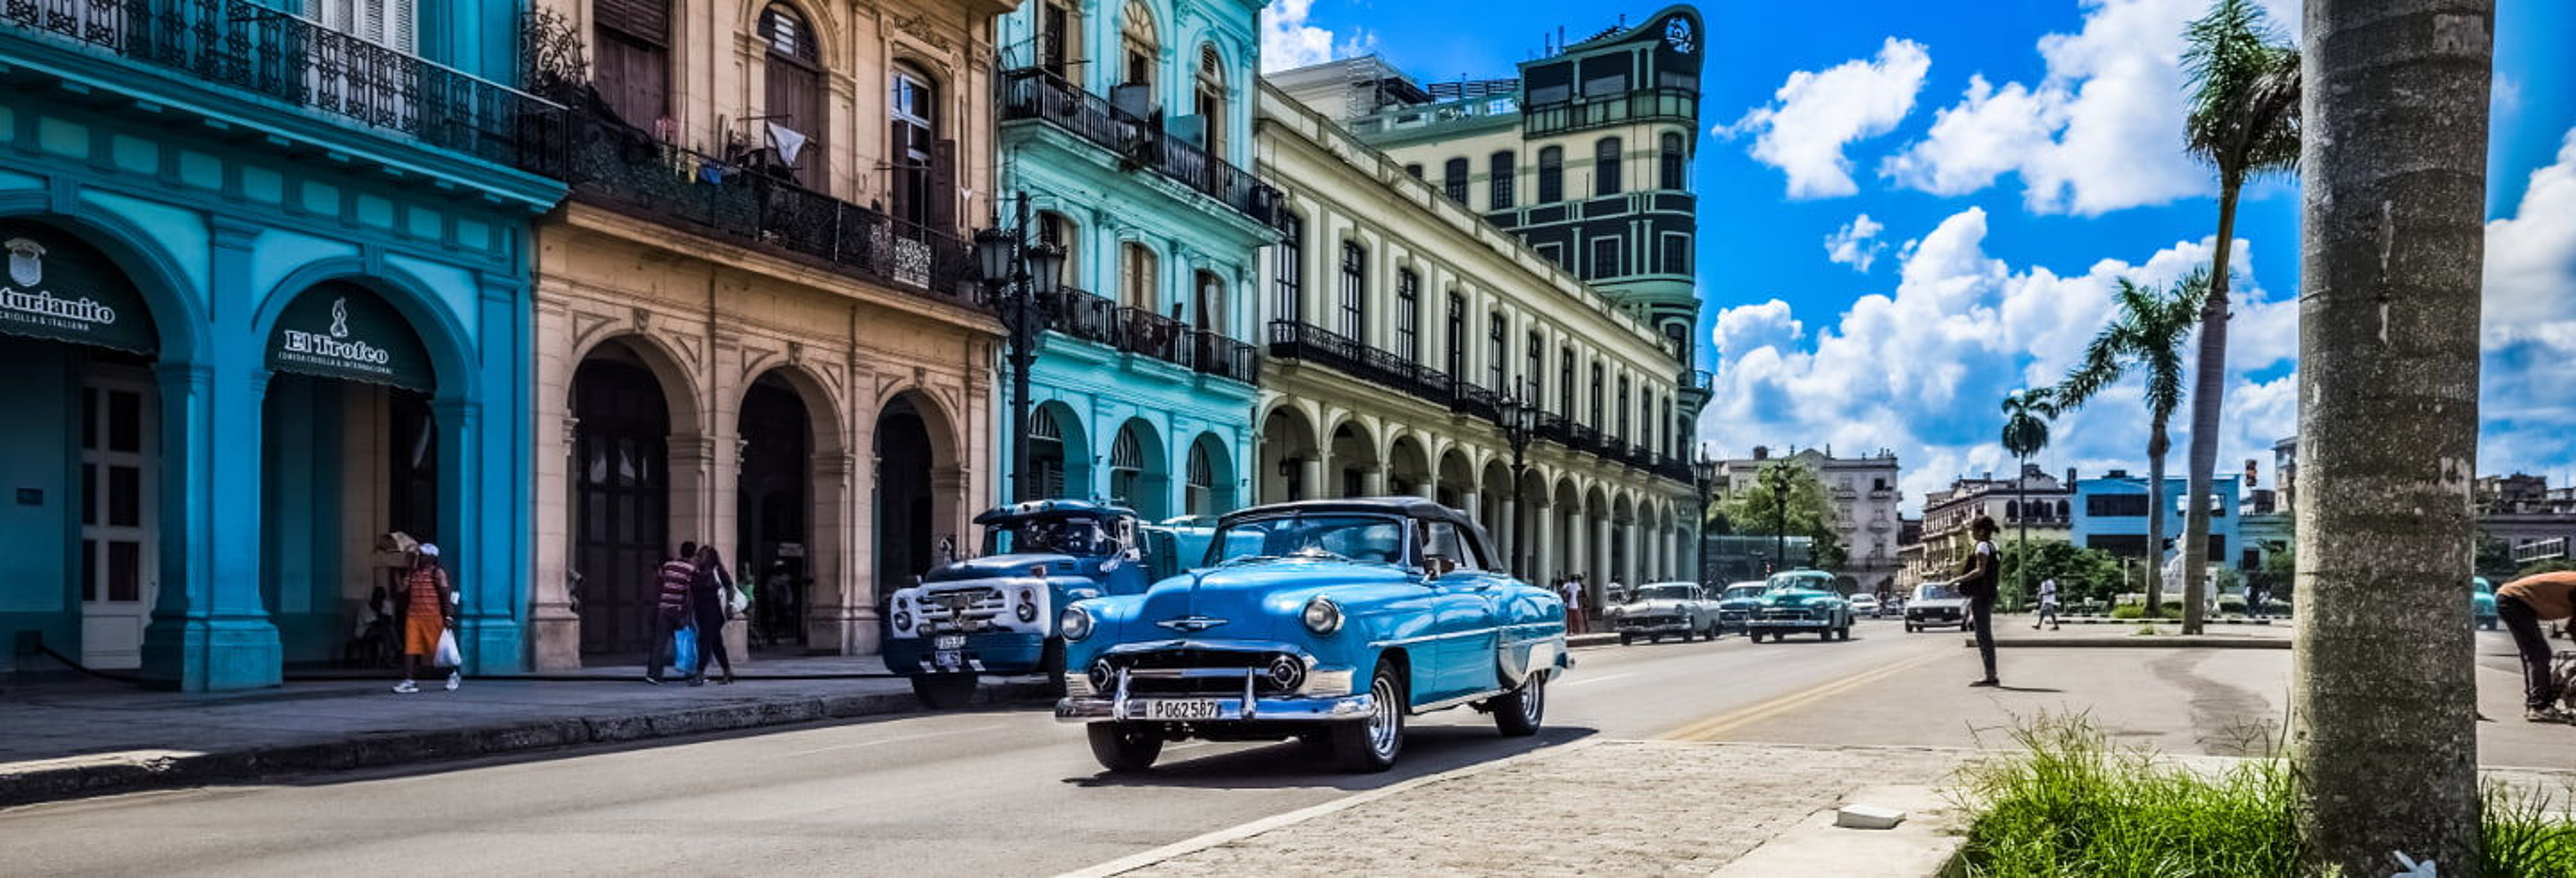 Free tour dell'Avana